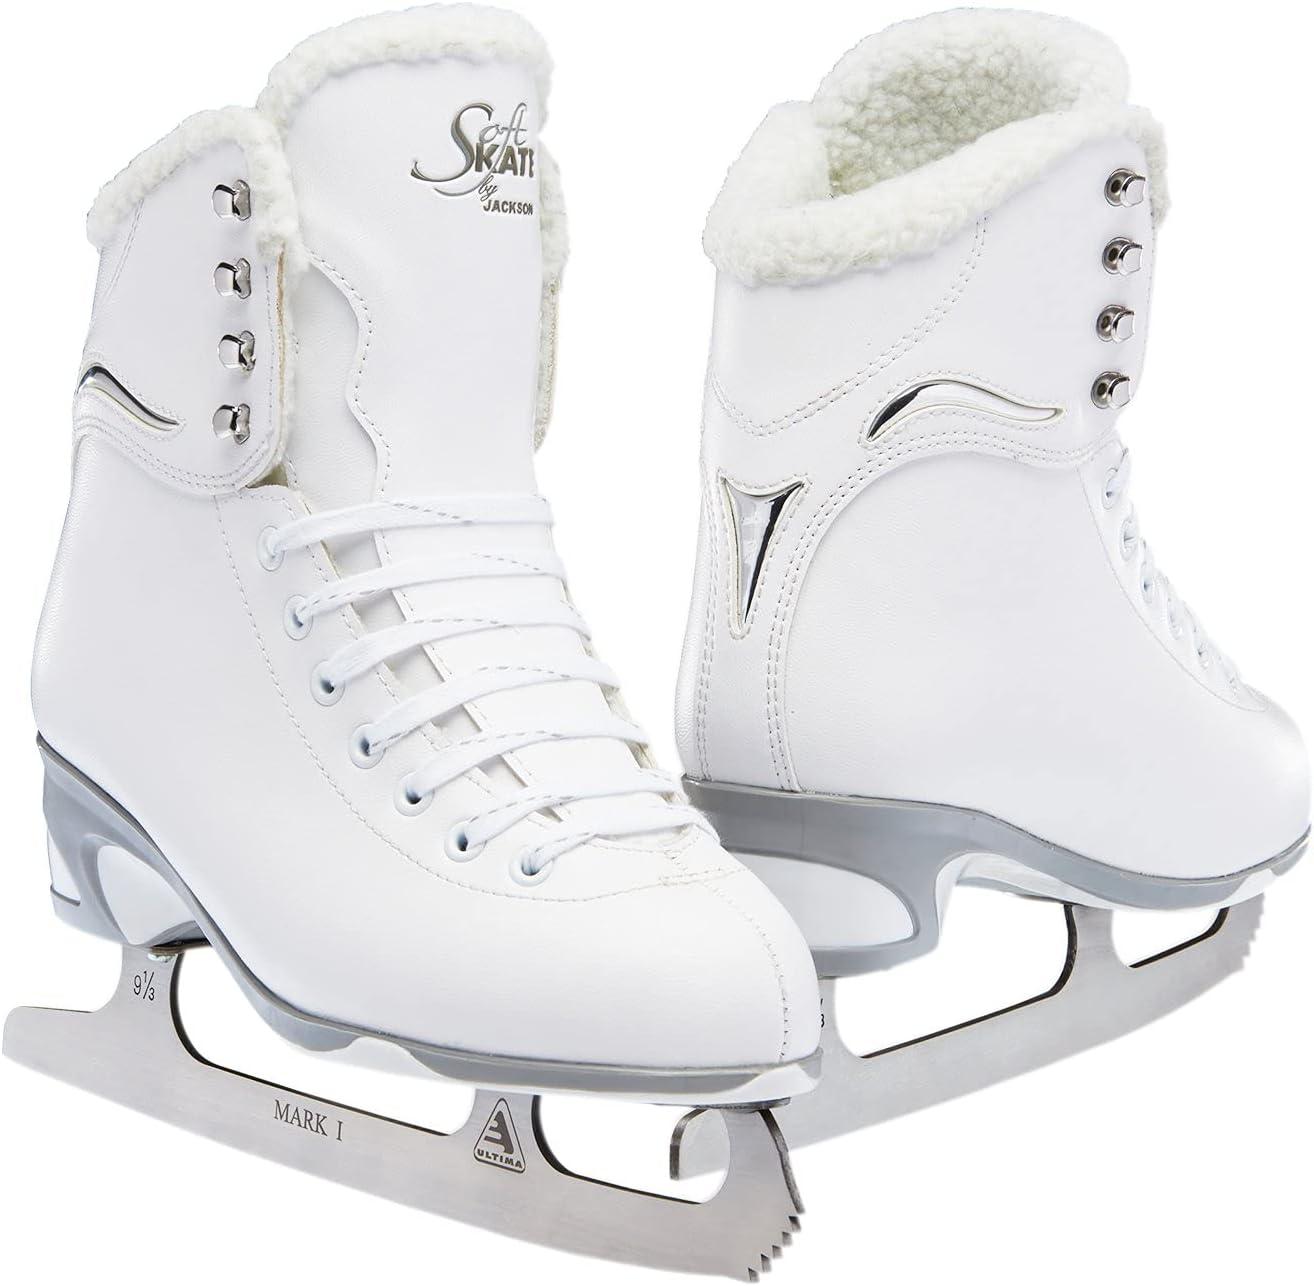 Jackson Ultima SoftSkate Womens Figure famous Girls Chicago Mall Skate